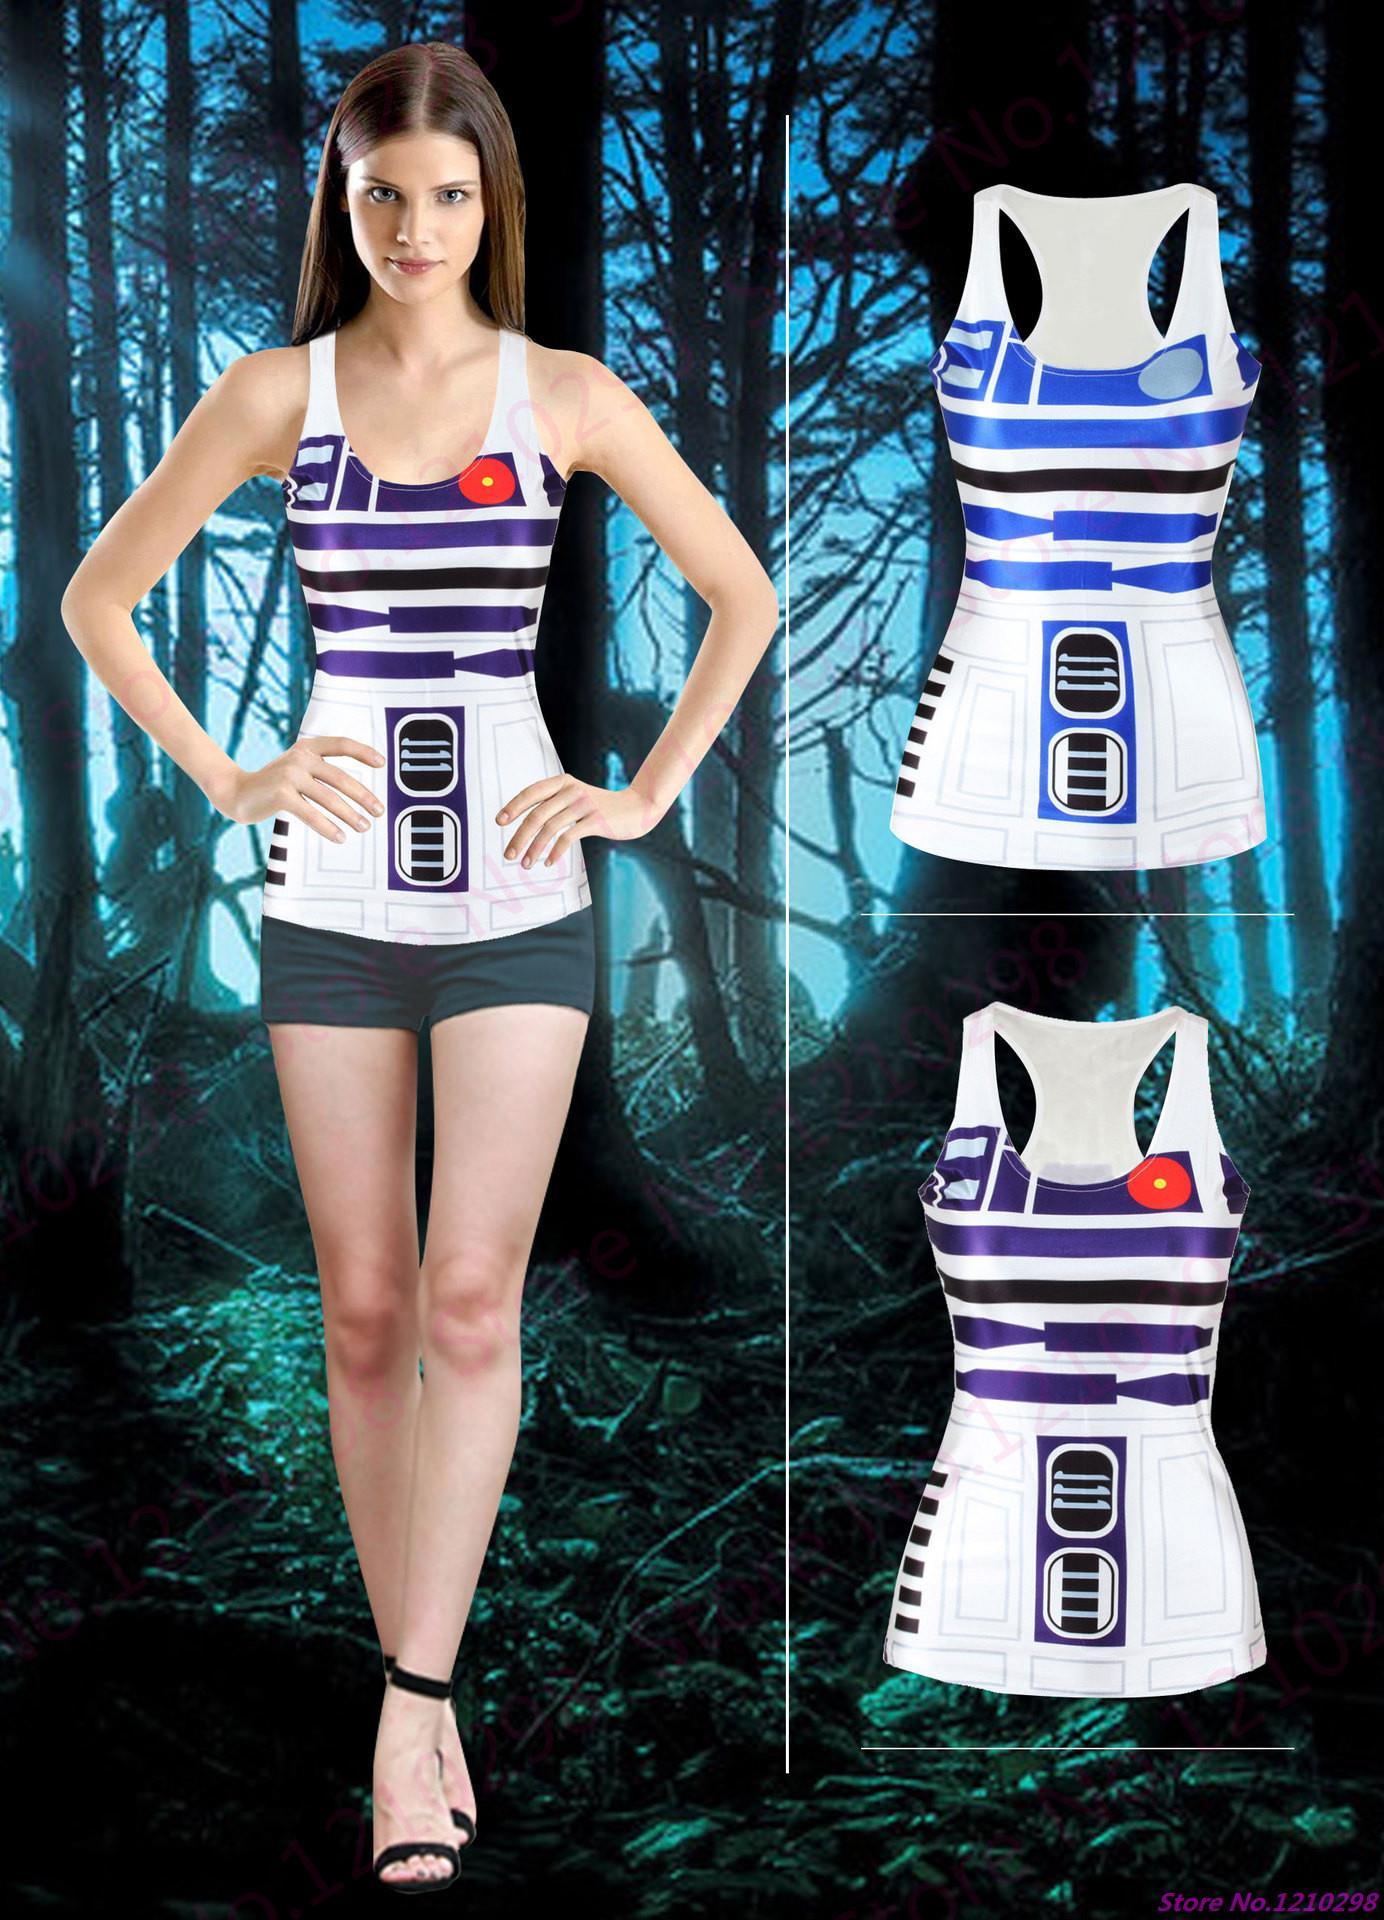 7885d17a0d7c4 Star wars robot yoga shirts running singlet white blue stripe jpg 1384x1920  R2d2 women